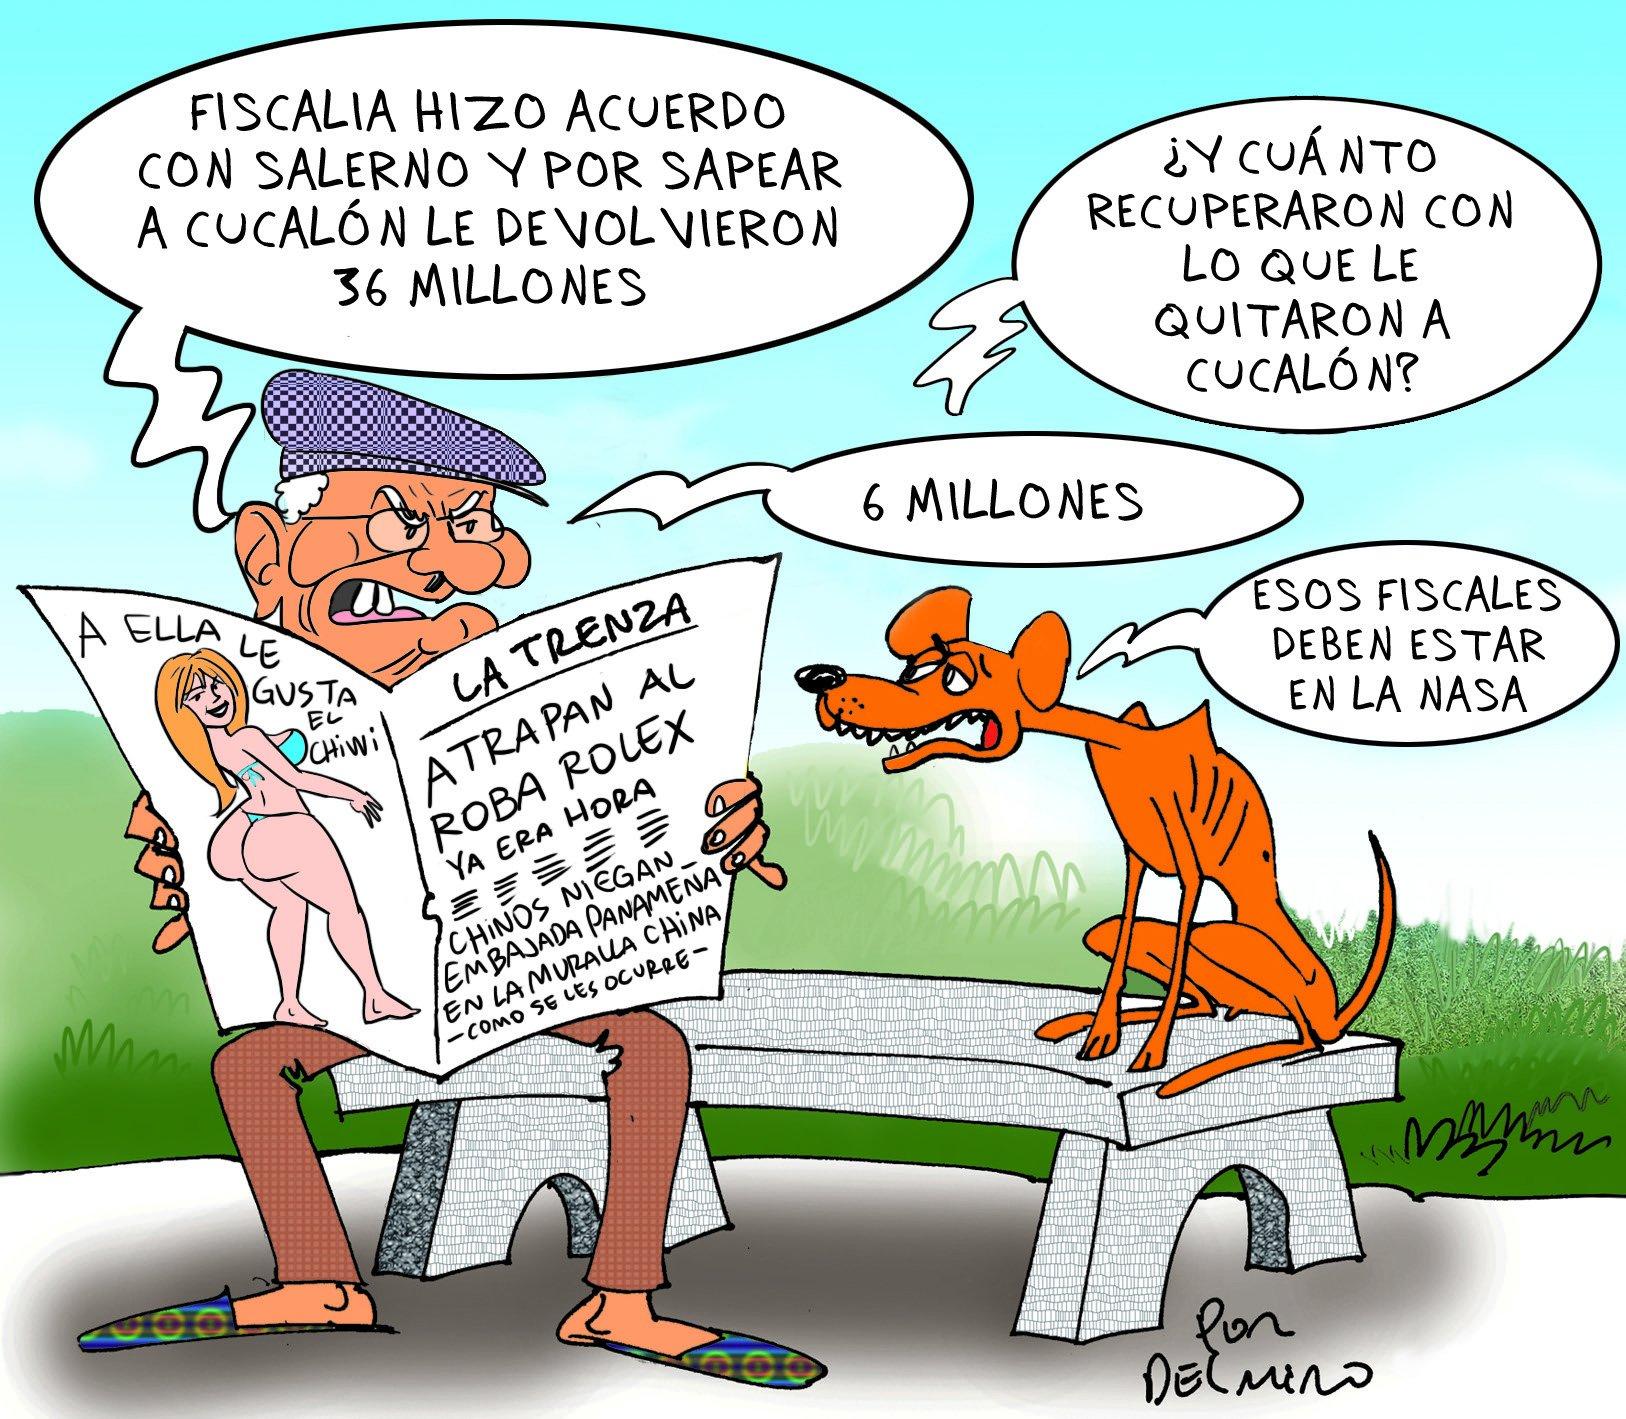 Salerno con la Suya | #Caricatura de @DelmiroQuiroga https://t.co/CWKByg2tuI